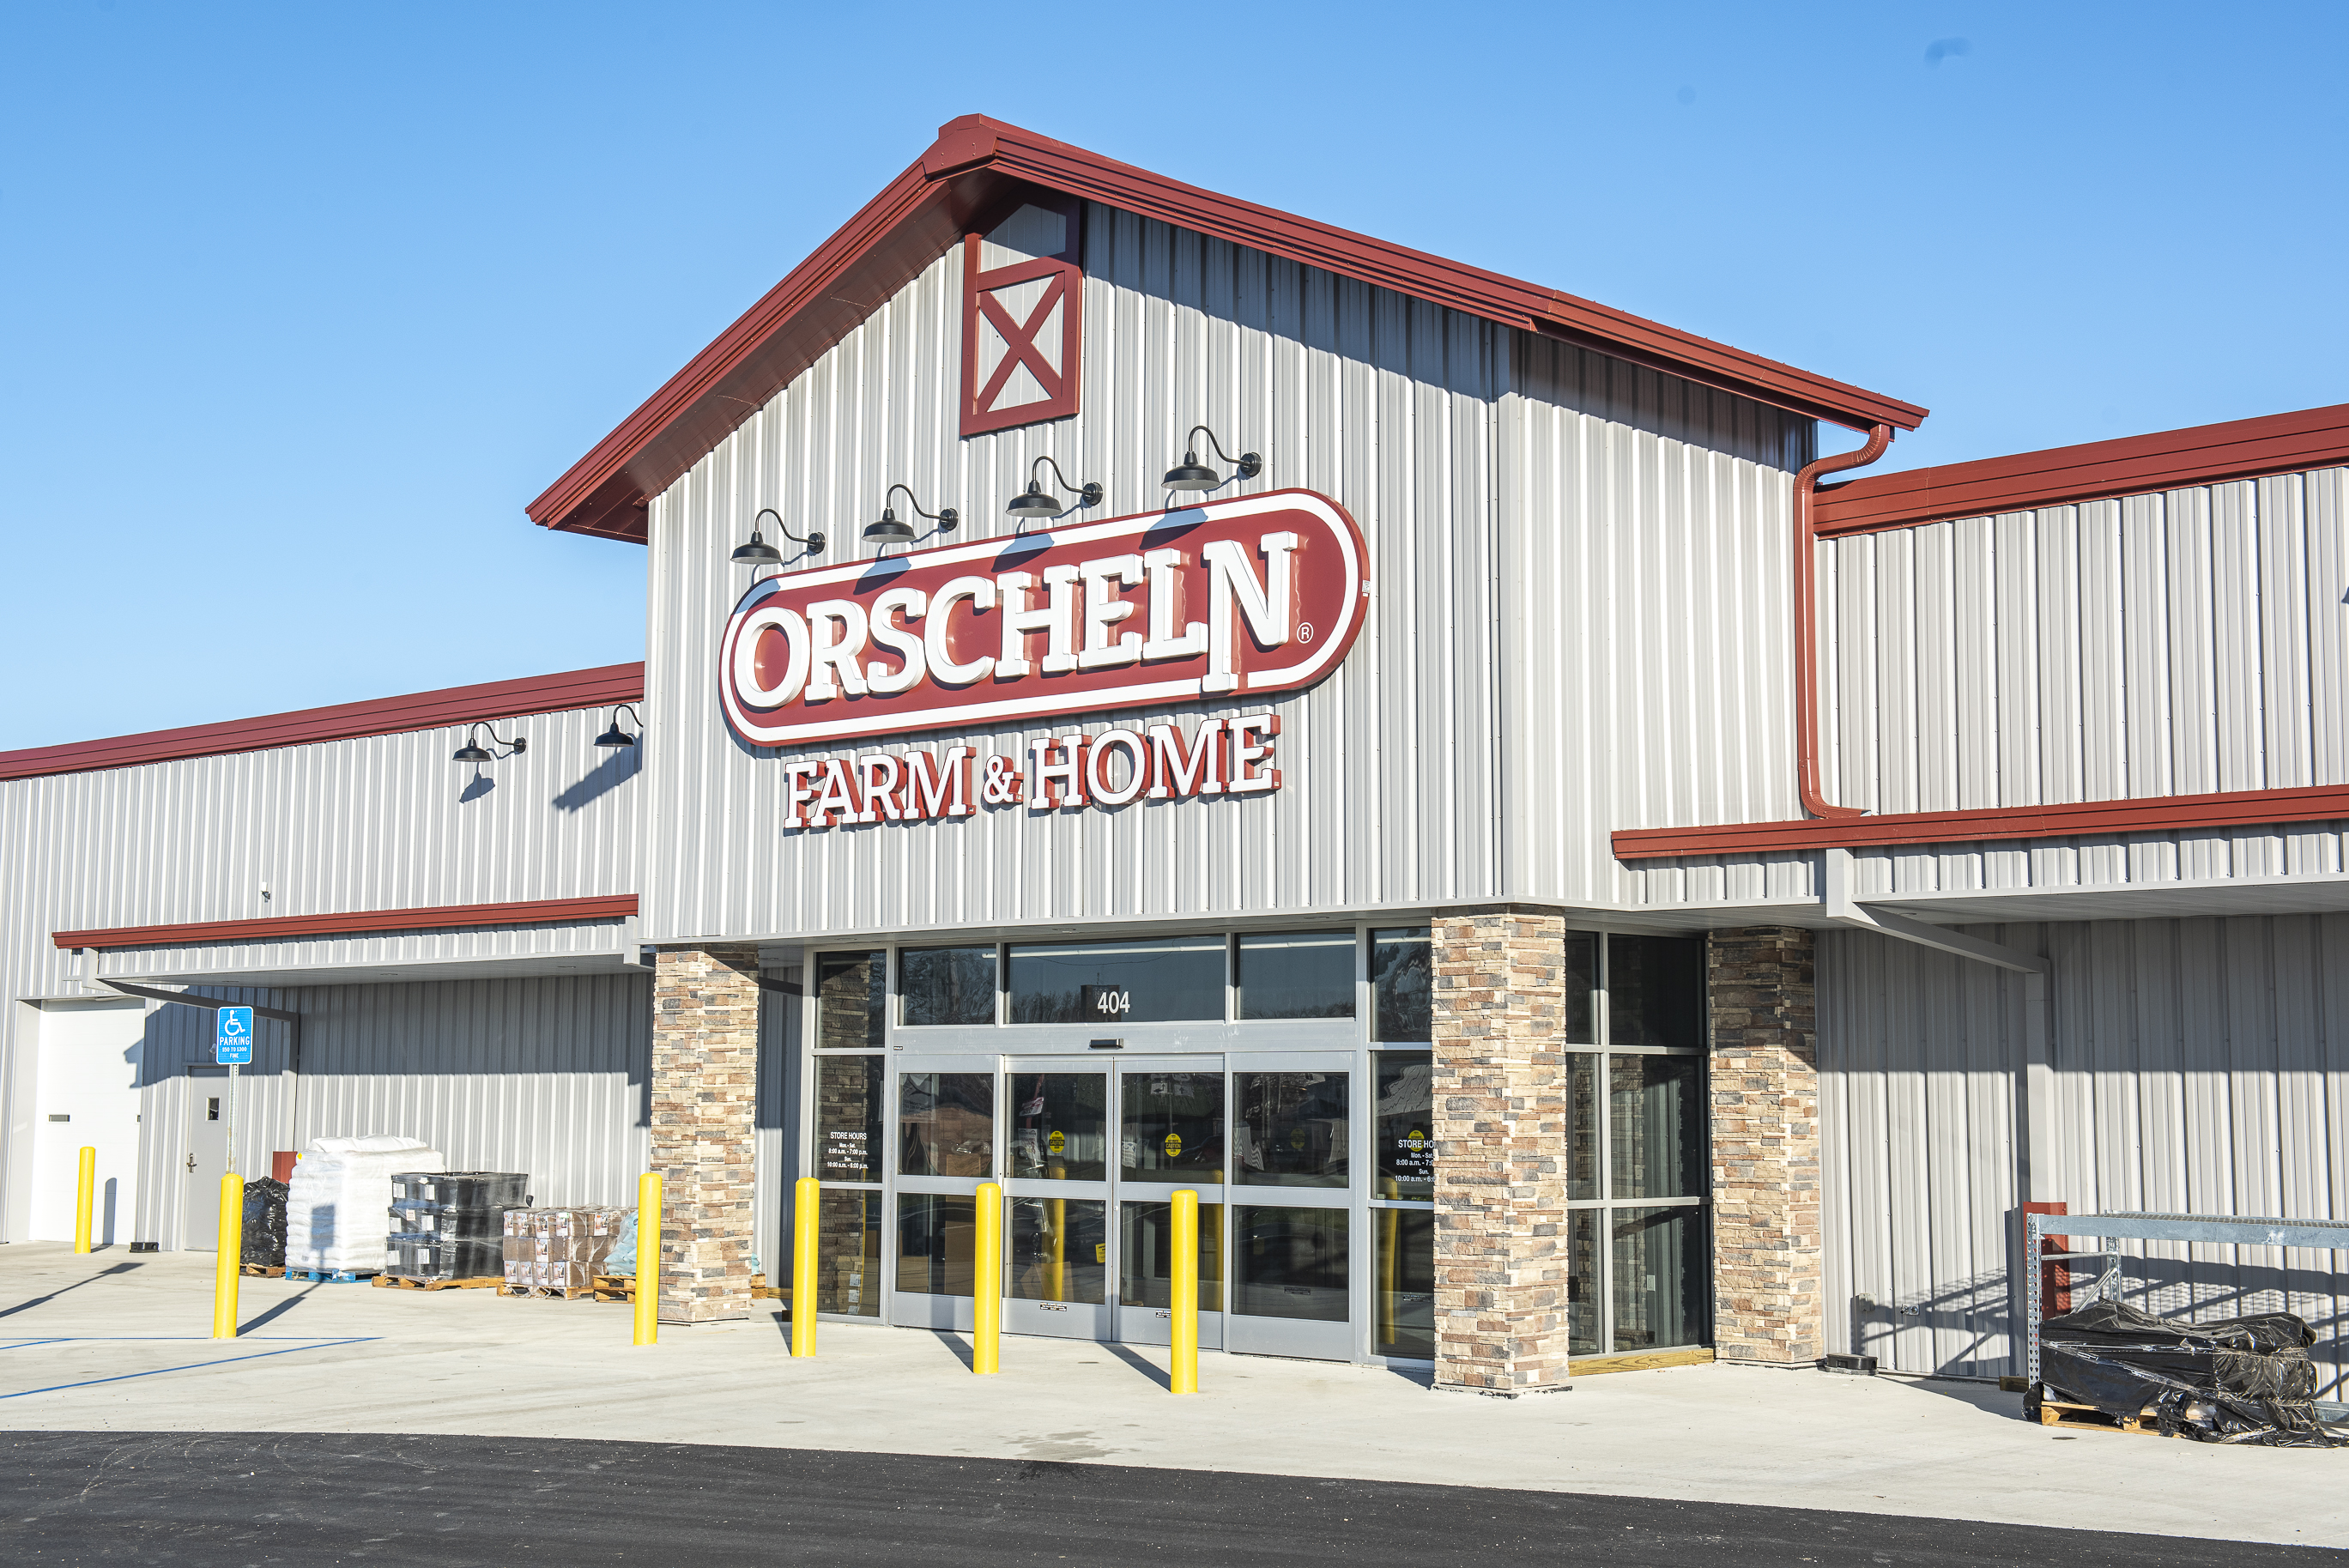 Front view of Orscheln Farm & Home Store in Ottawa, Kansas 66067